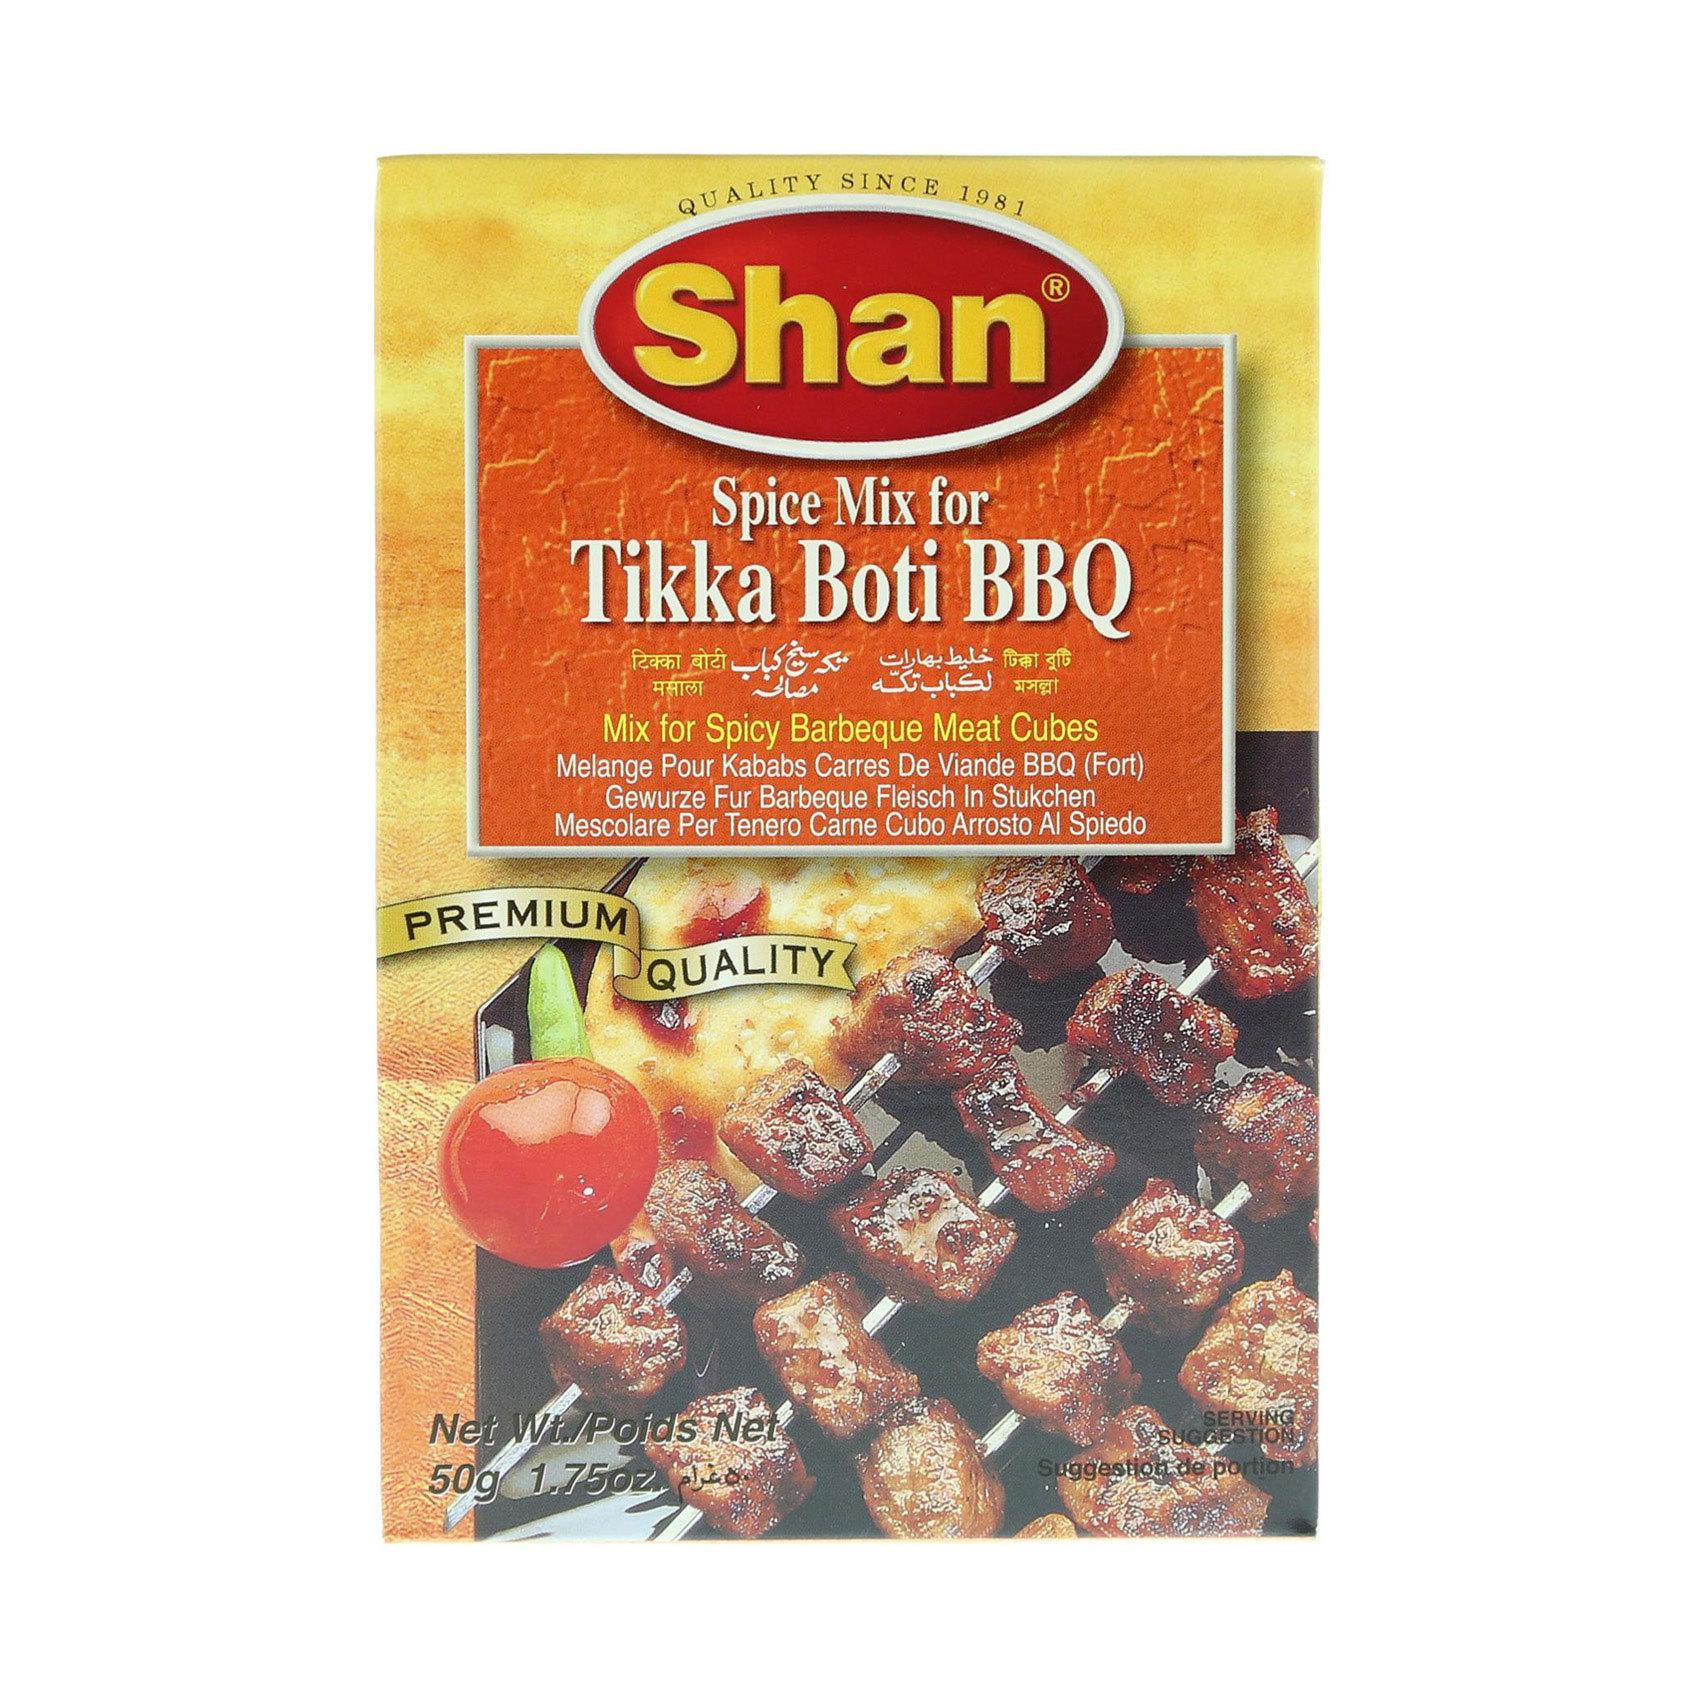 SHAN TIKKA BOTI BBQ MIX 50G